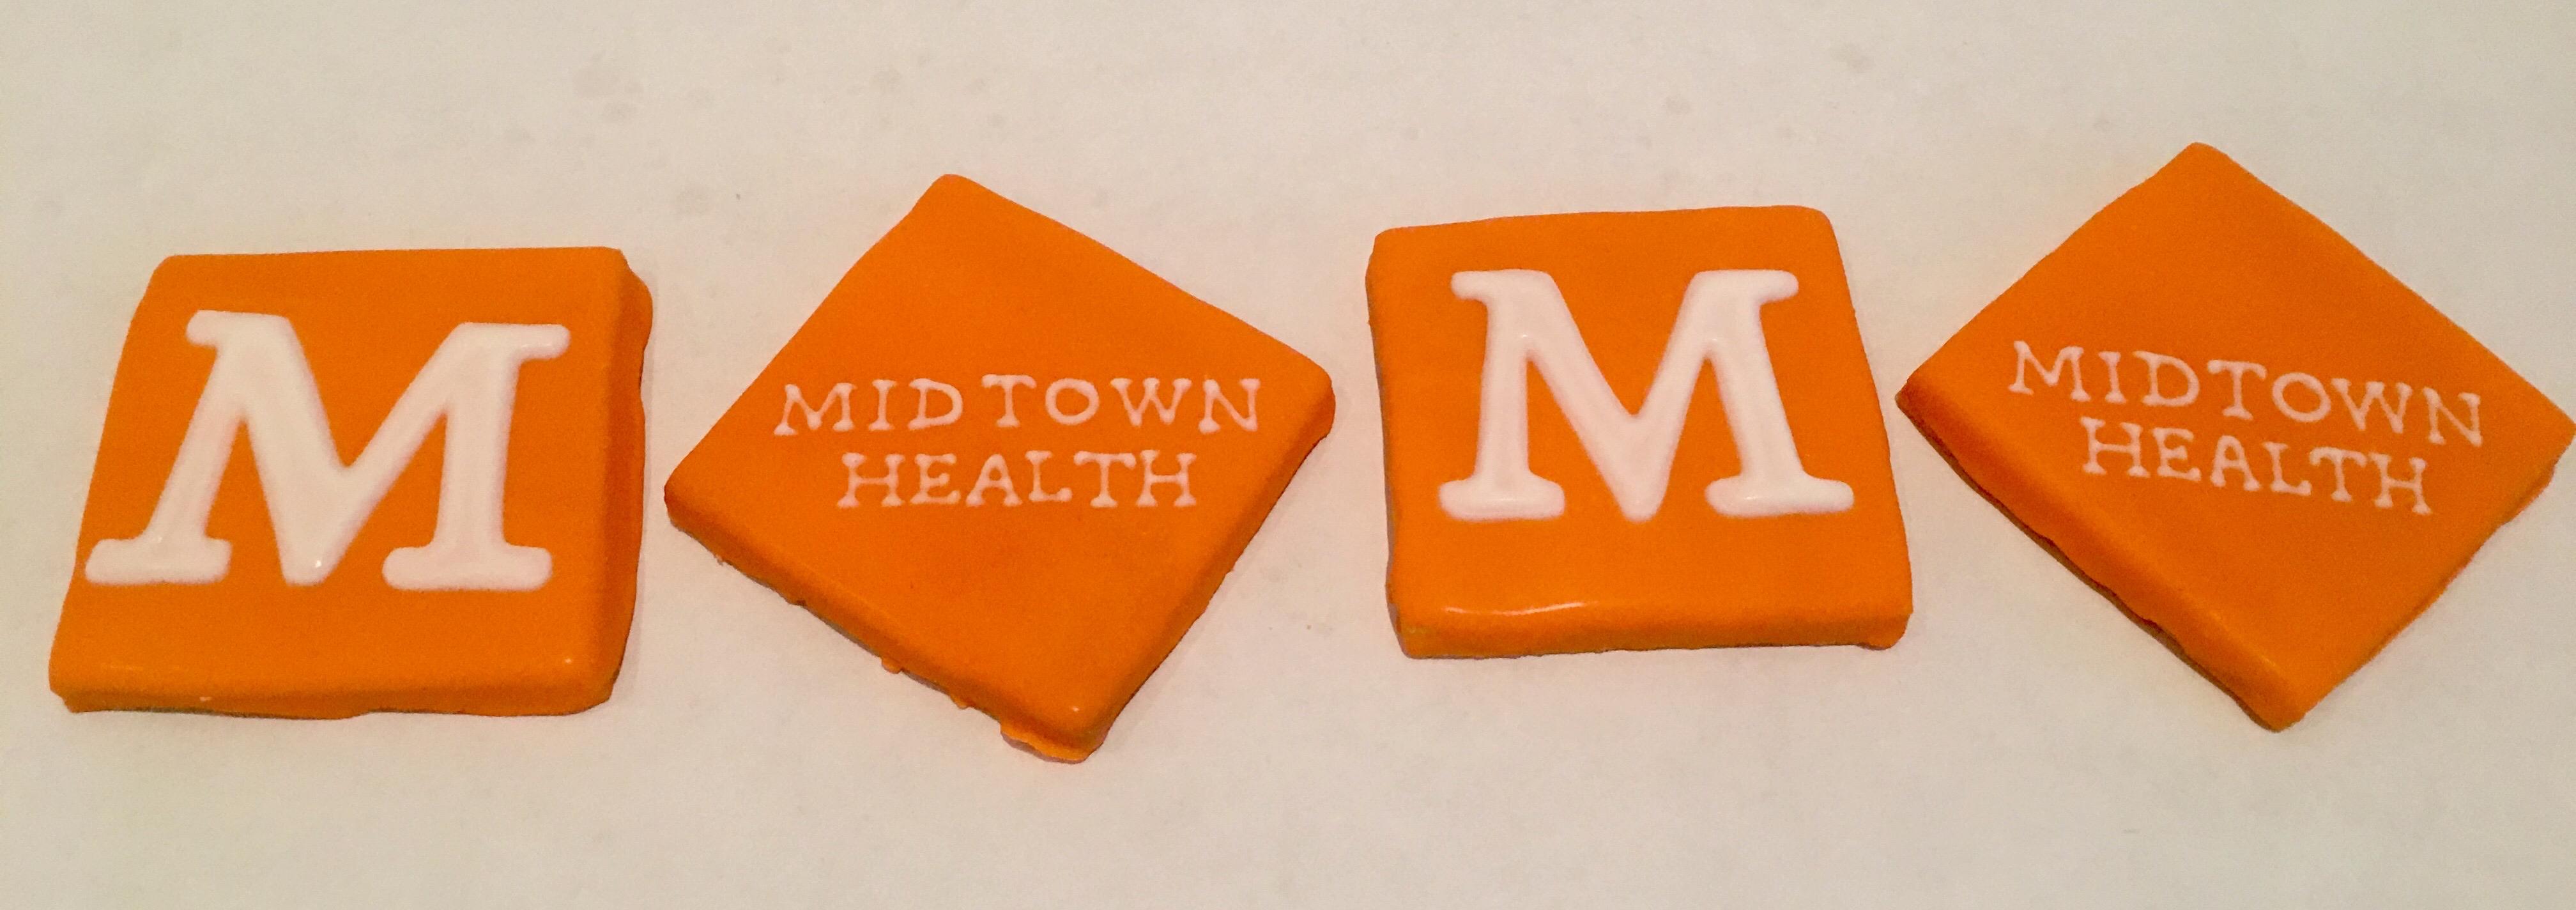 Midtown Health